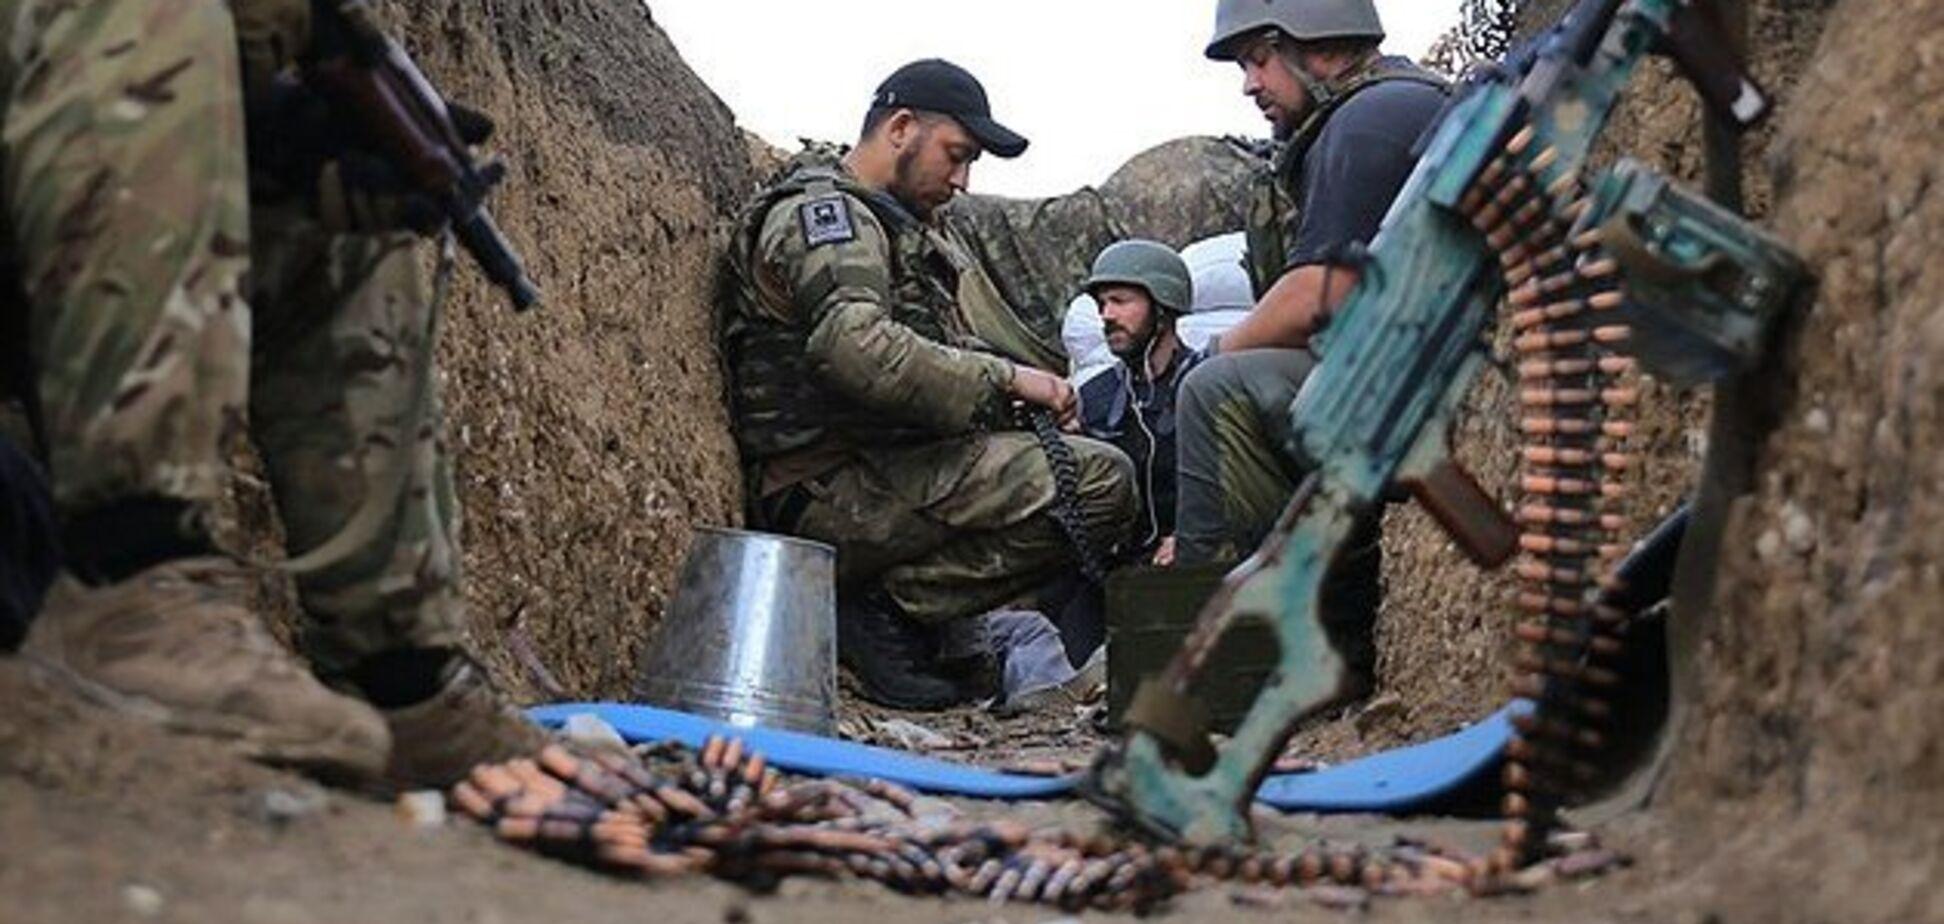 Террористы ''Л/ДНР'' подключили снайперов: ранены бойцы ОС